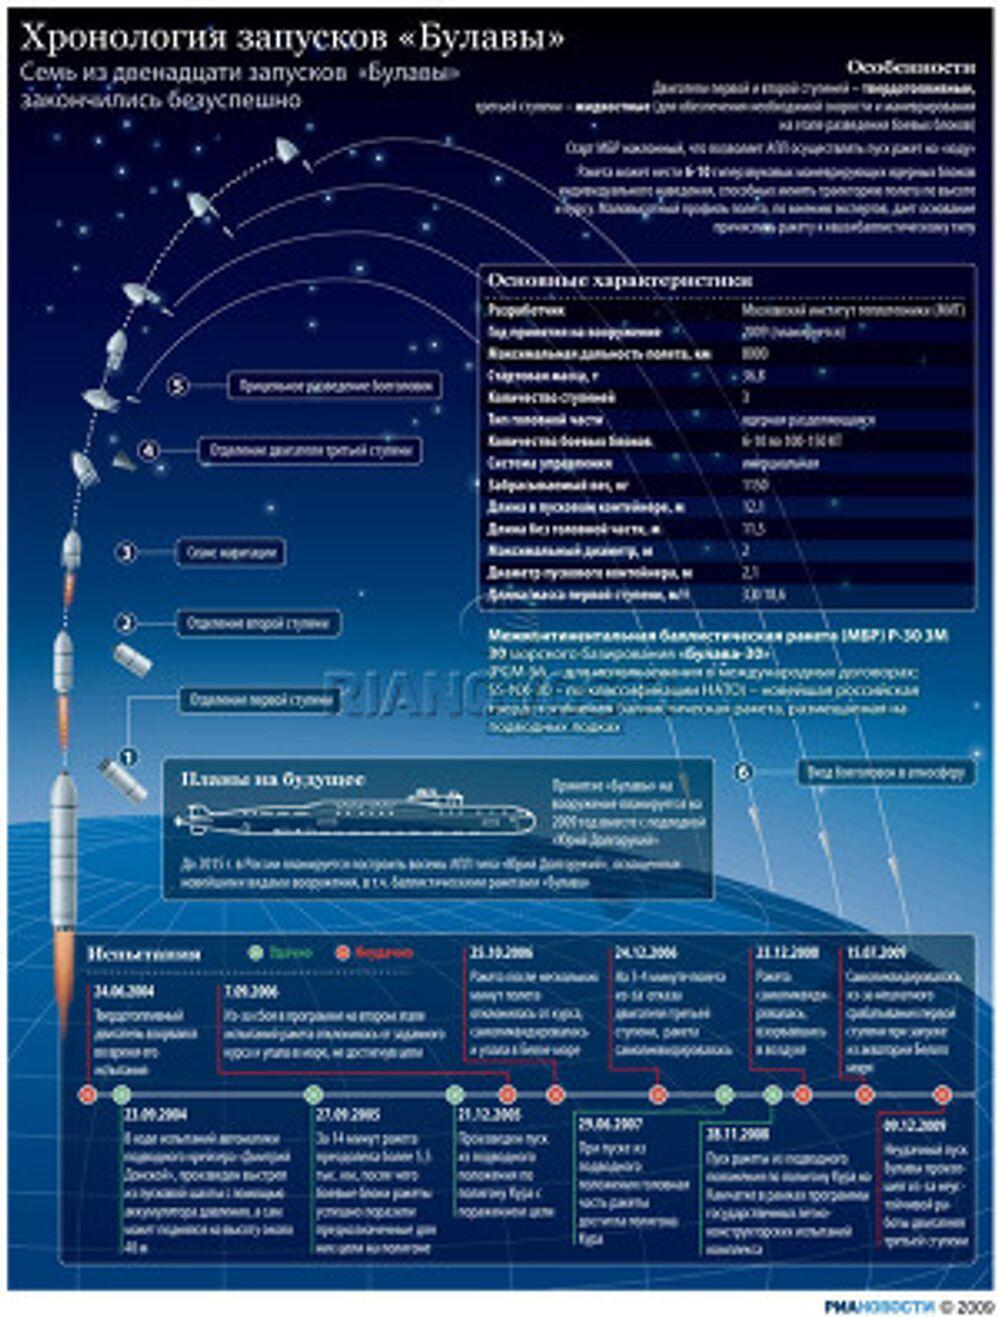 Хронология запусков «Булавы»